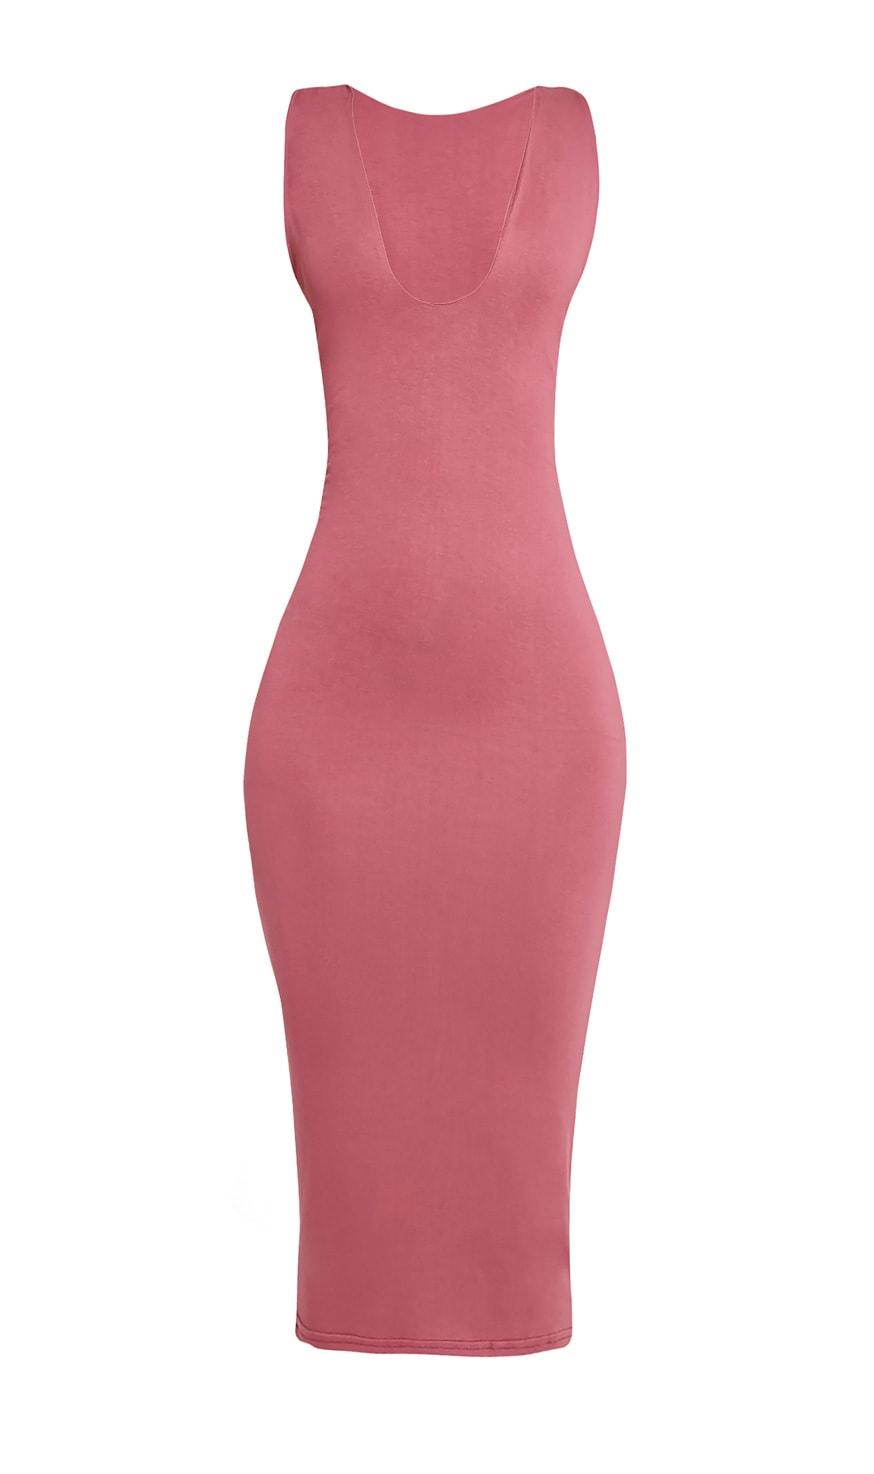 Basic Rose Plunge Jersey Midi Dress 3